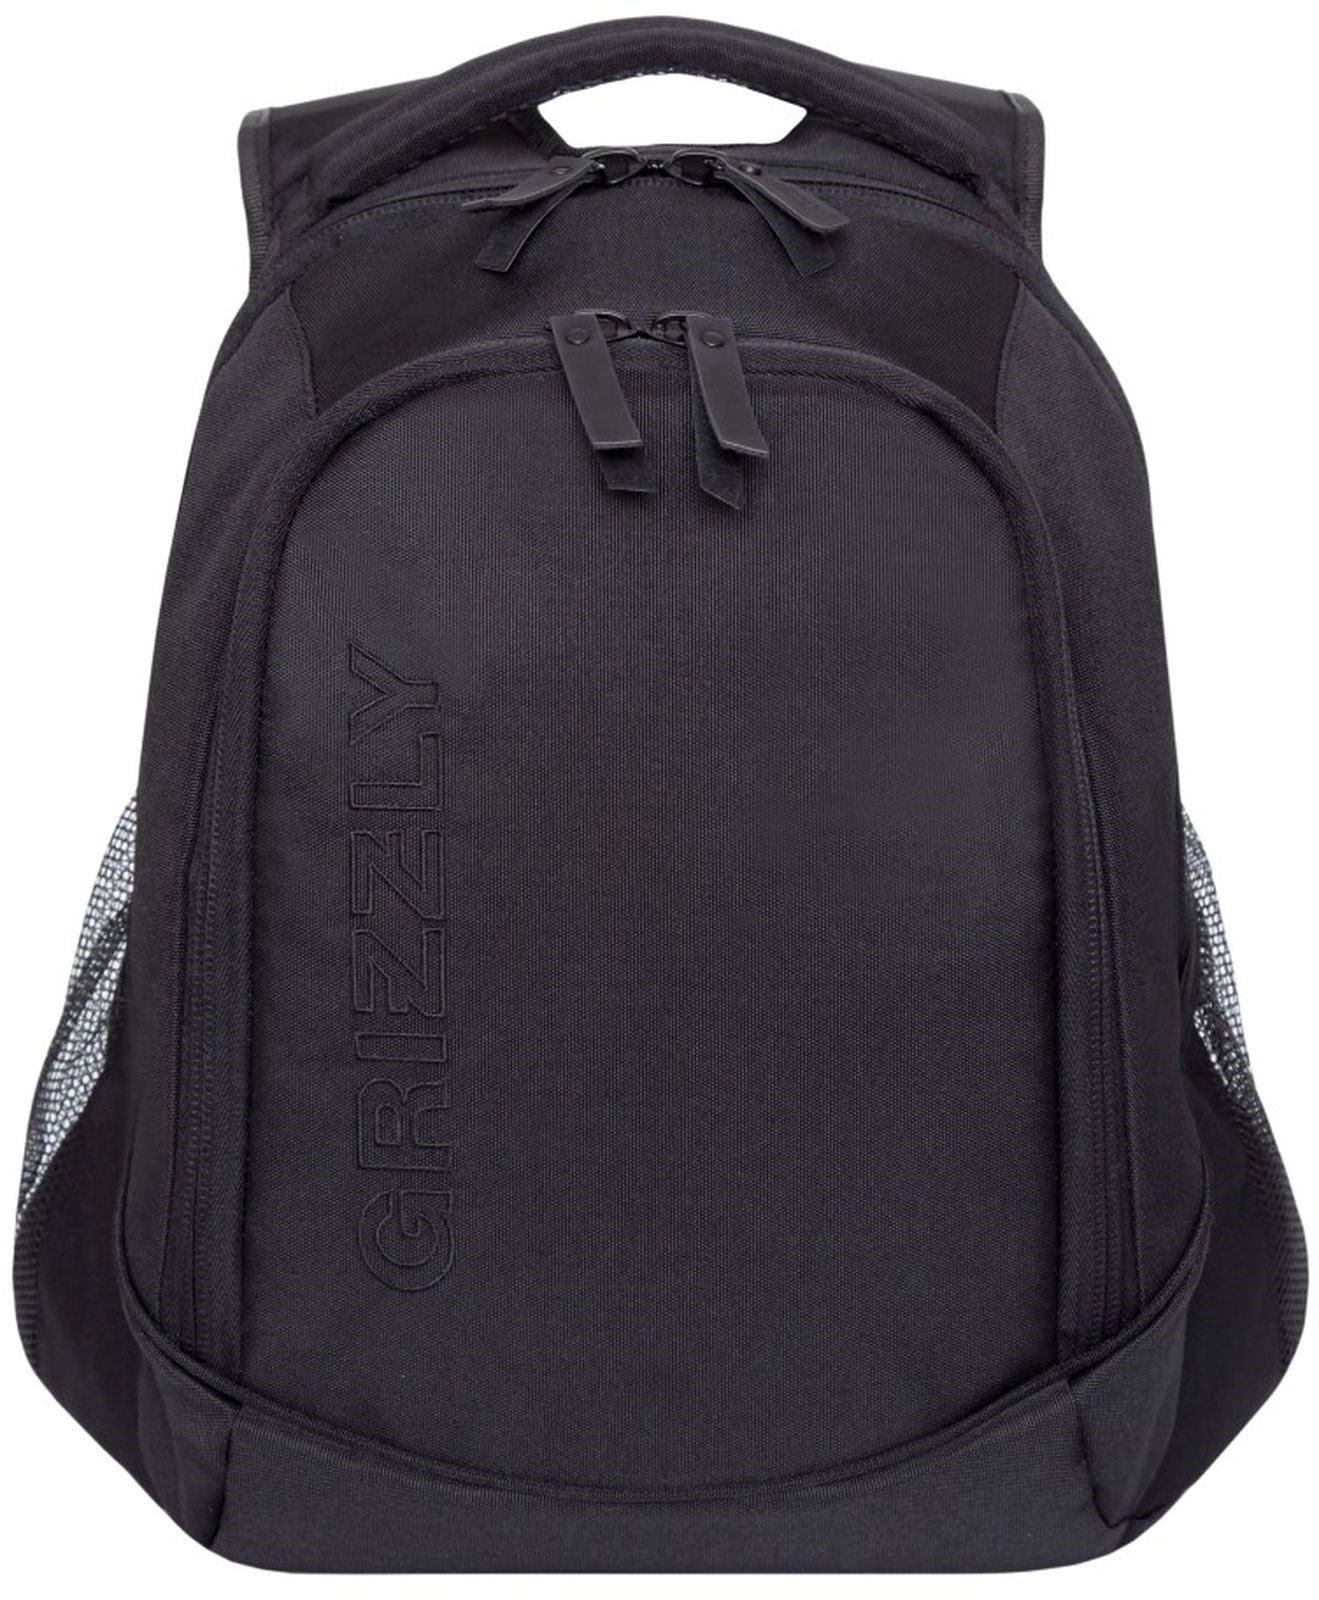 Рюкзак Grizzly, RU-928-2/3, черный рюкзак молодежный grizzly 16 л ru 808 2 2